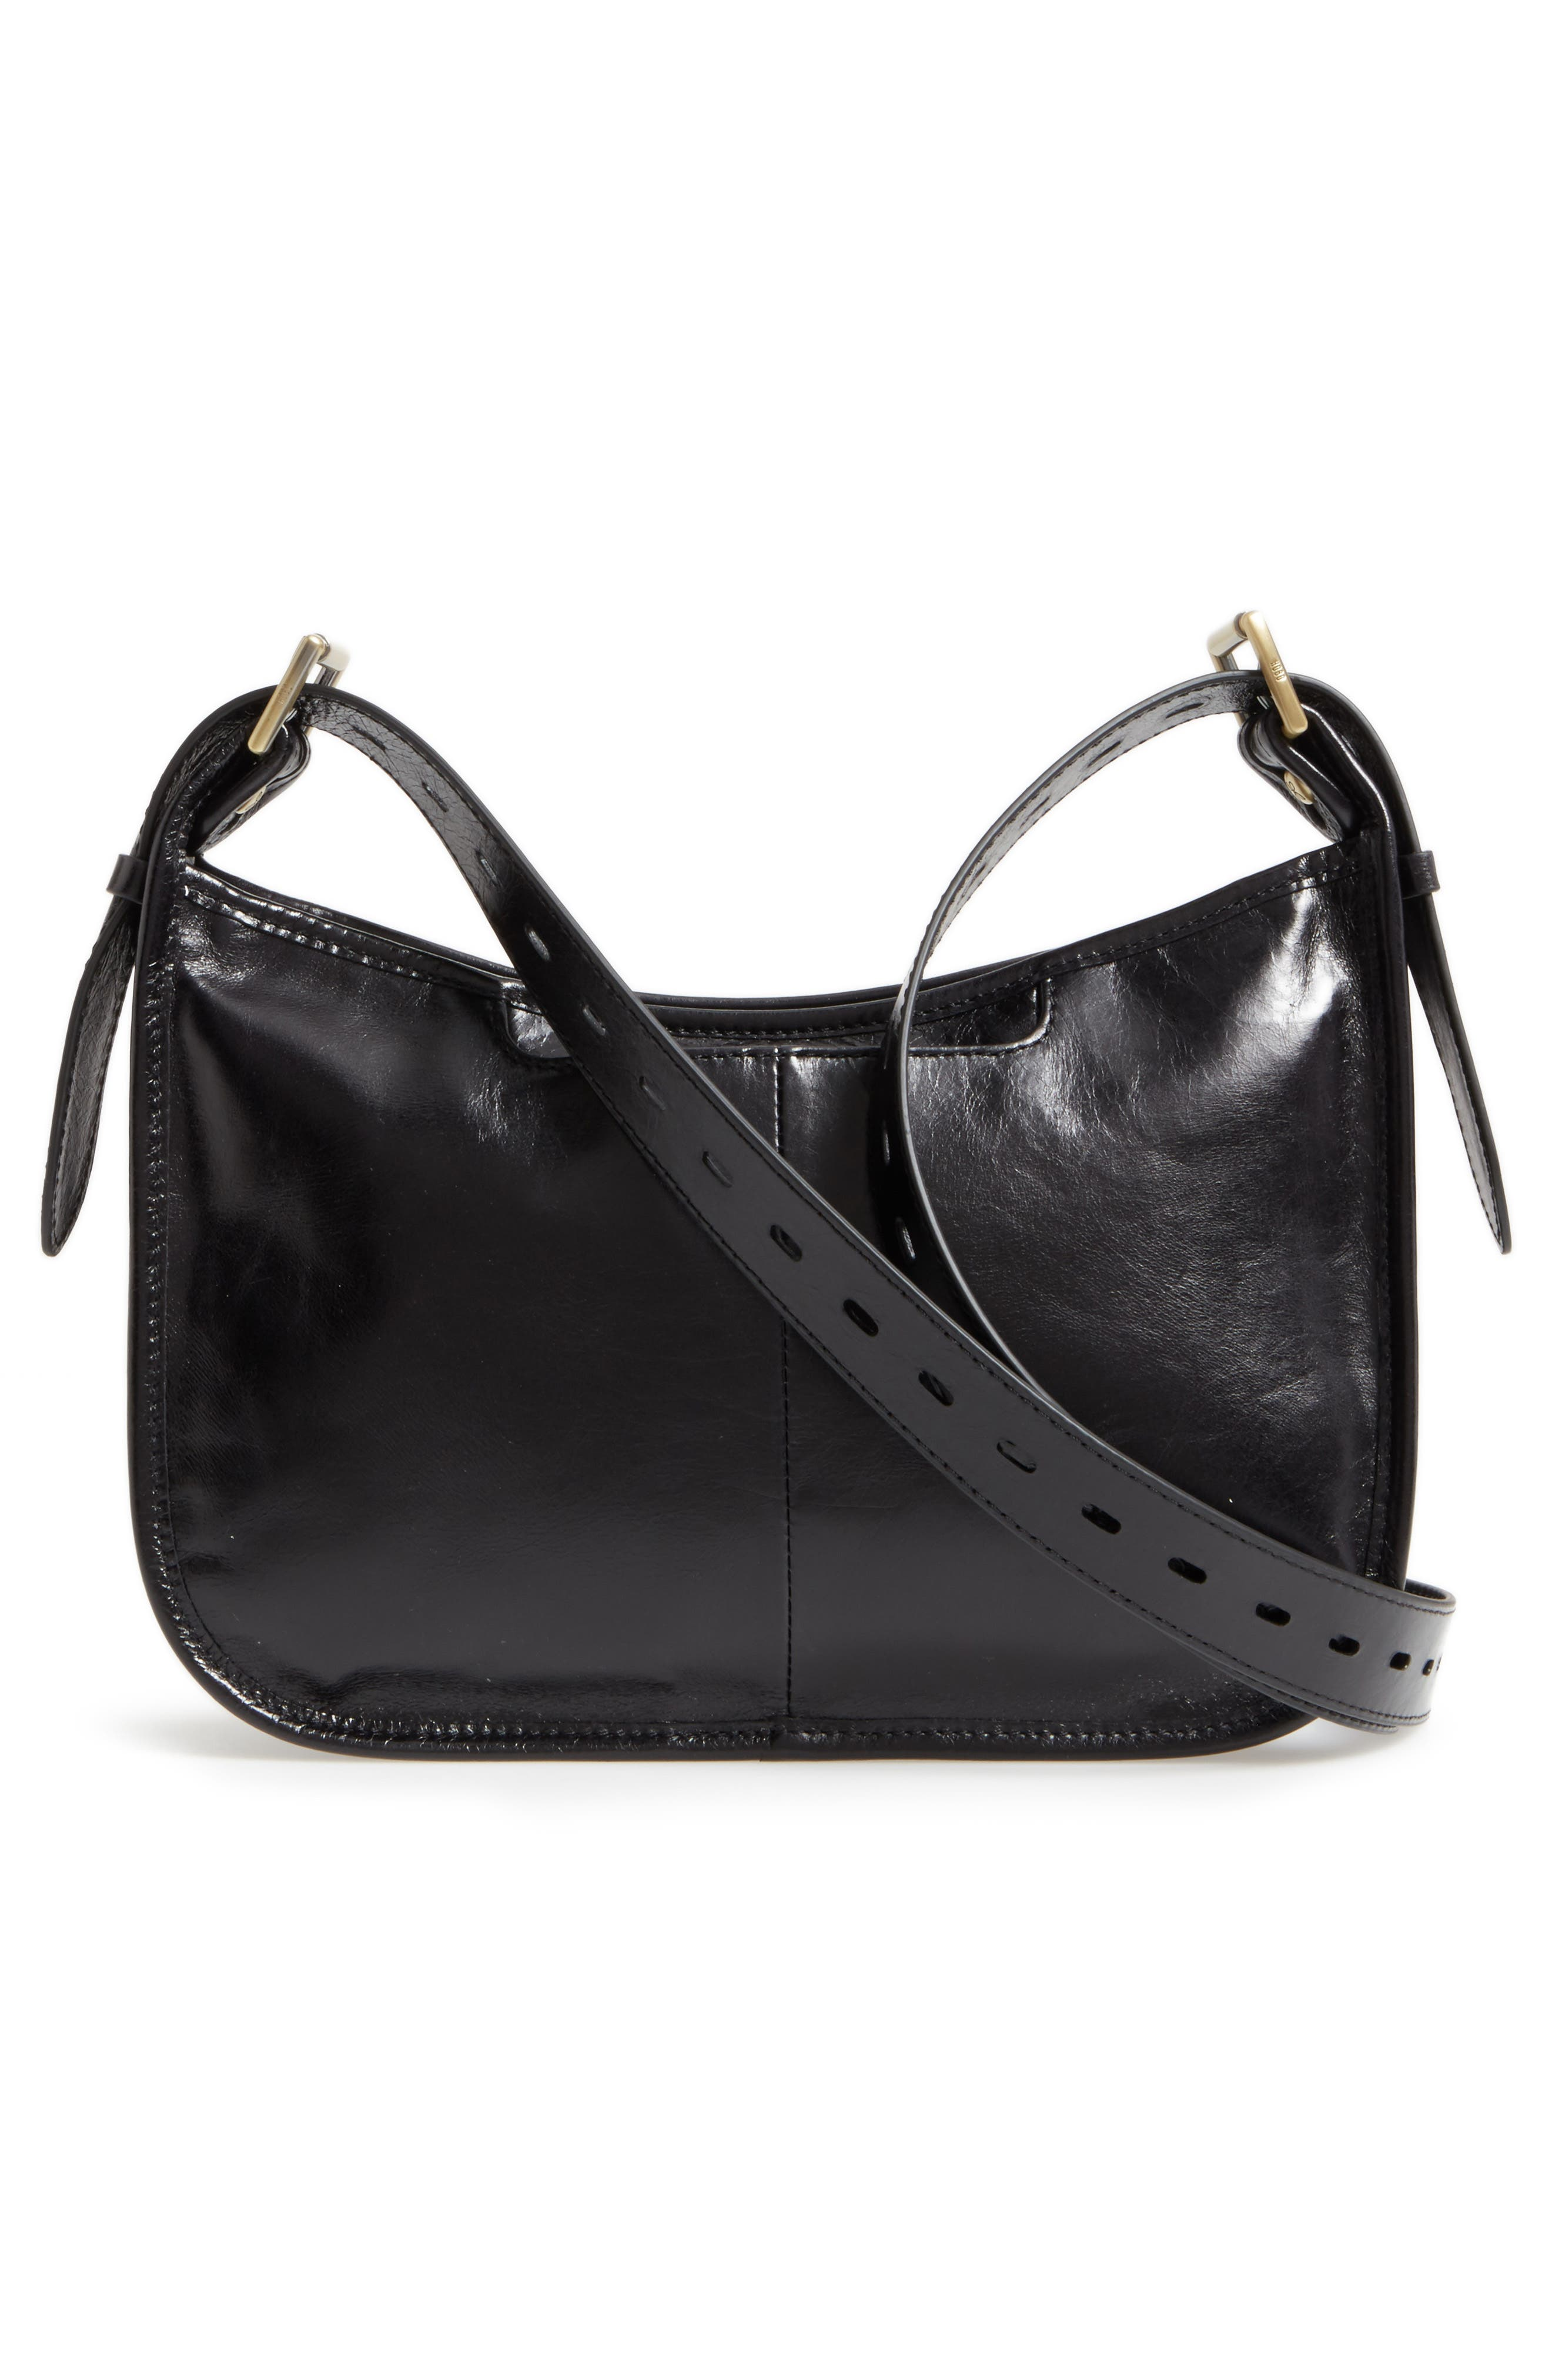 Chase Calfskin Leather Crossbody Bag,                             Alternate thumbnail 3, color,                             BLACK